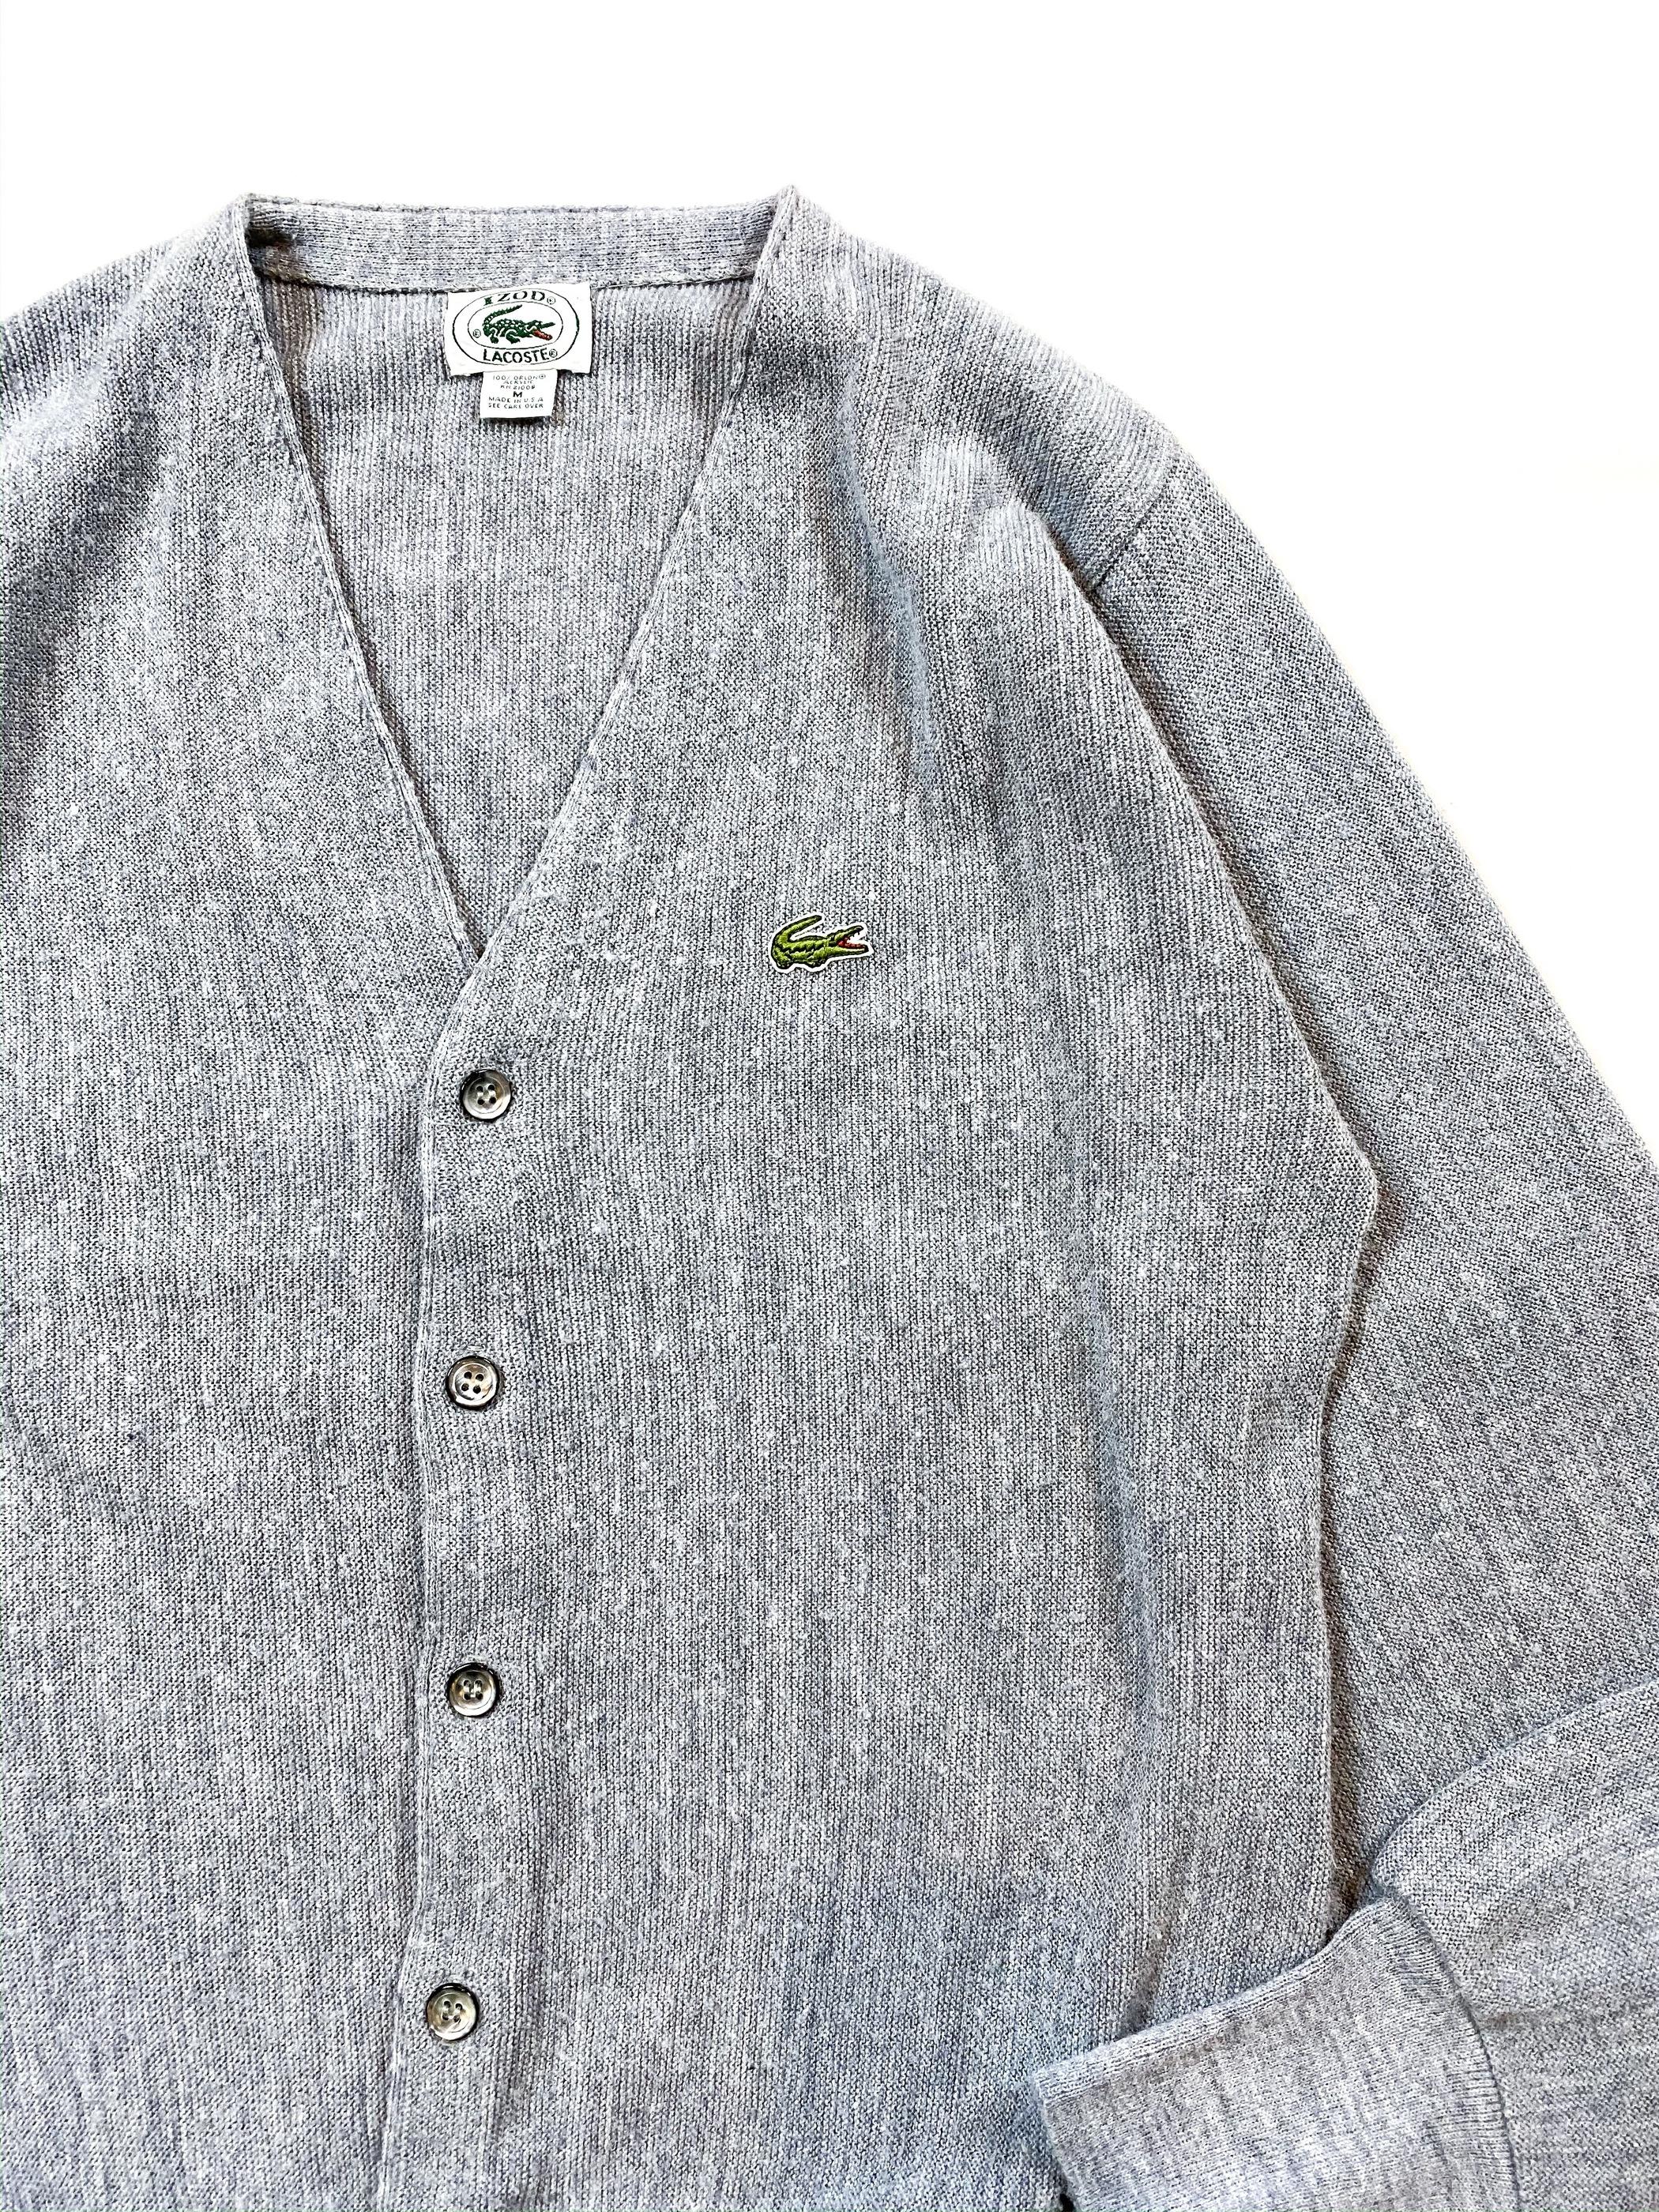 80's IZOD LACOSTE acrylic knit cardigan